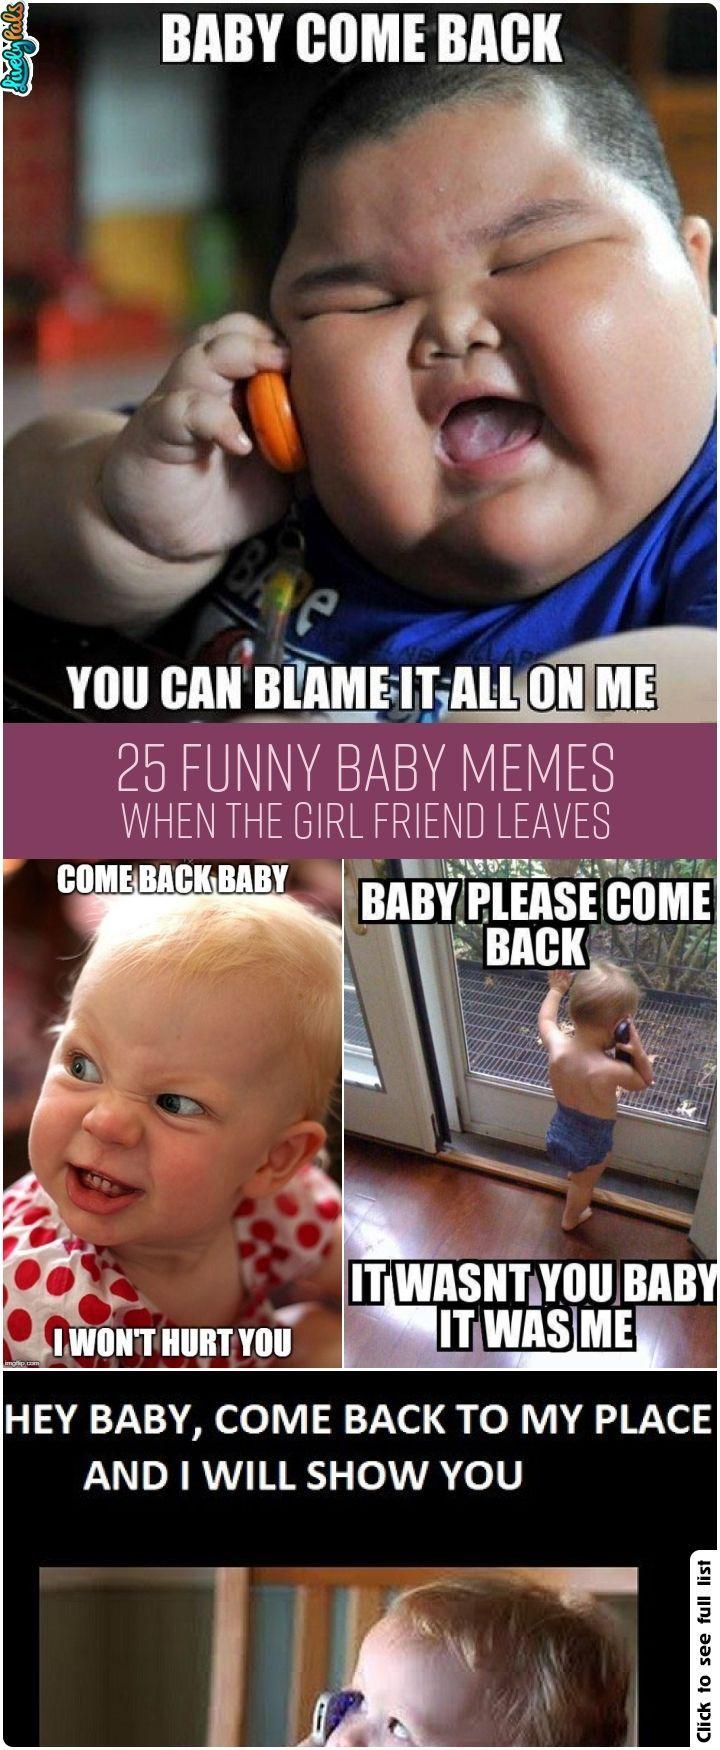 Baby Come Back Broom Meme